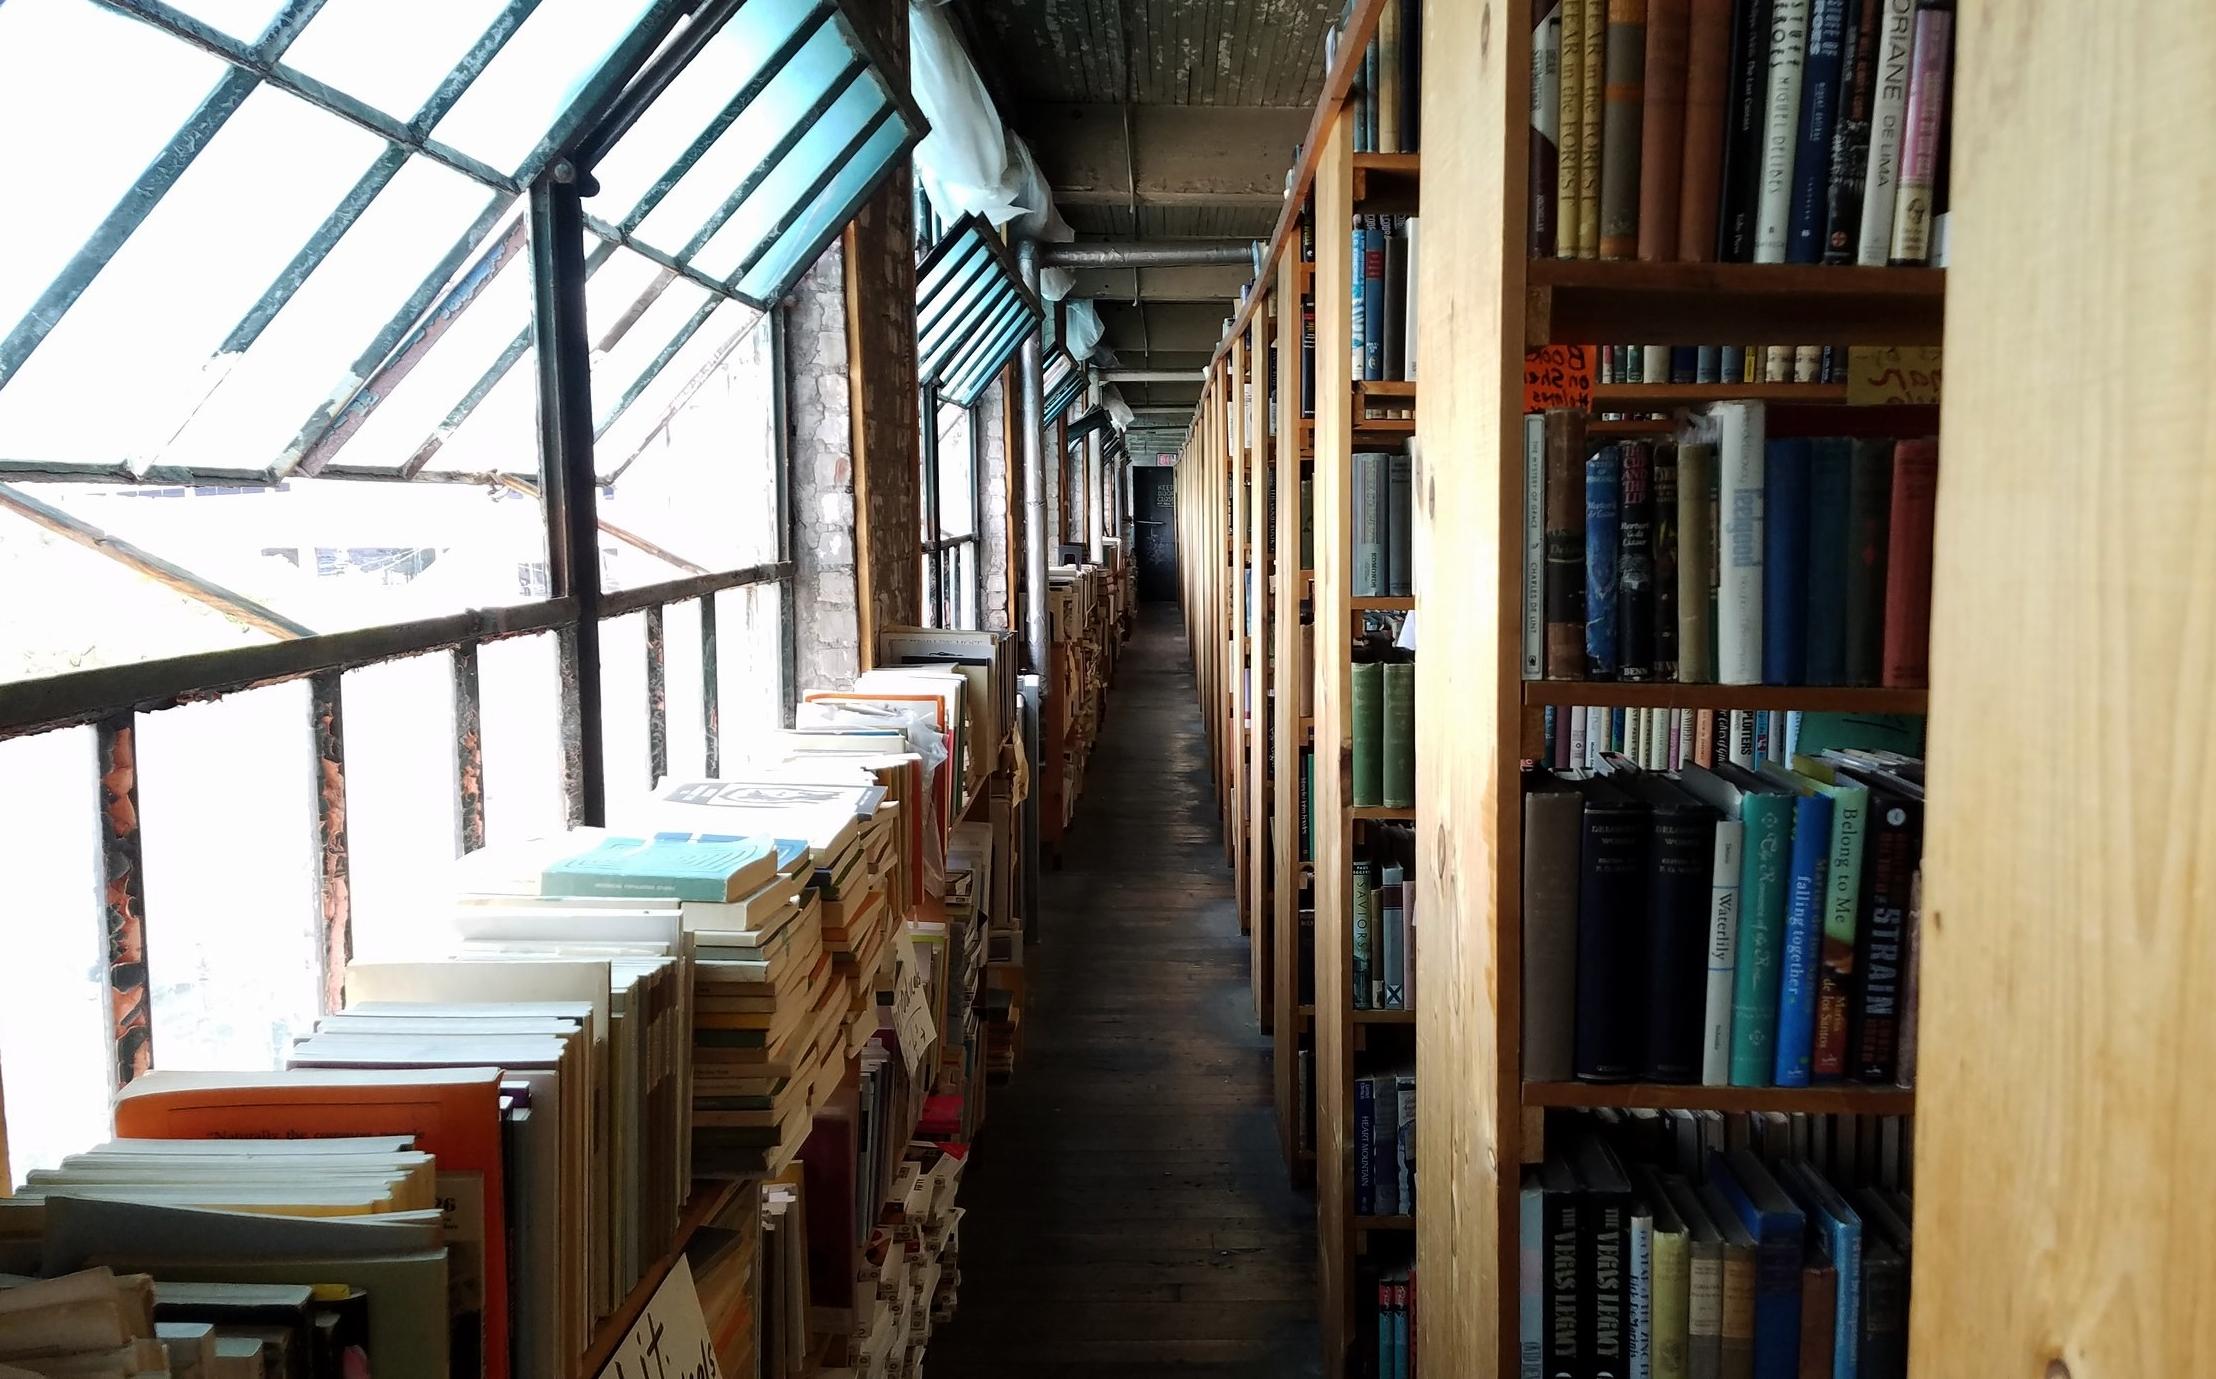 A peek inside John K. King Used & Rare Books on W. Lafayette Blvd.